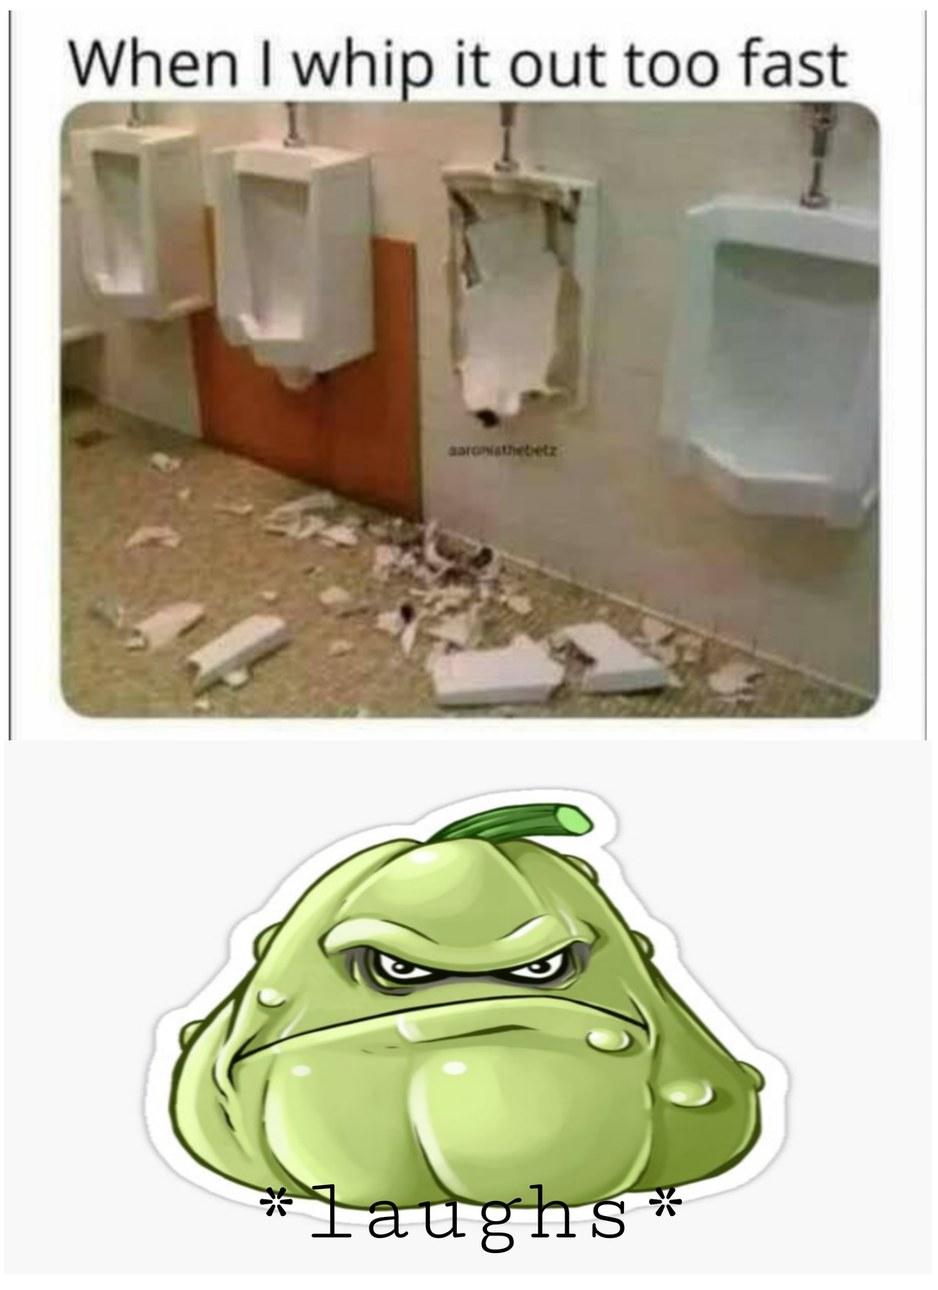 tremenda mierda los memes gringos xd